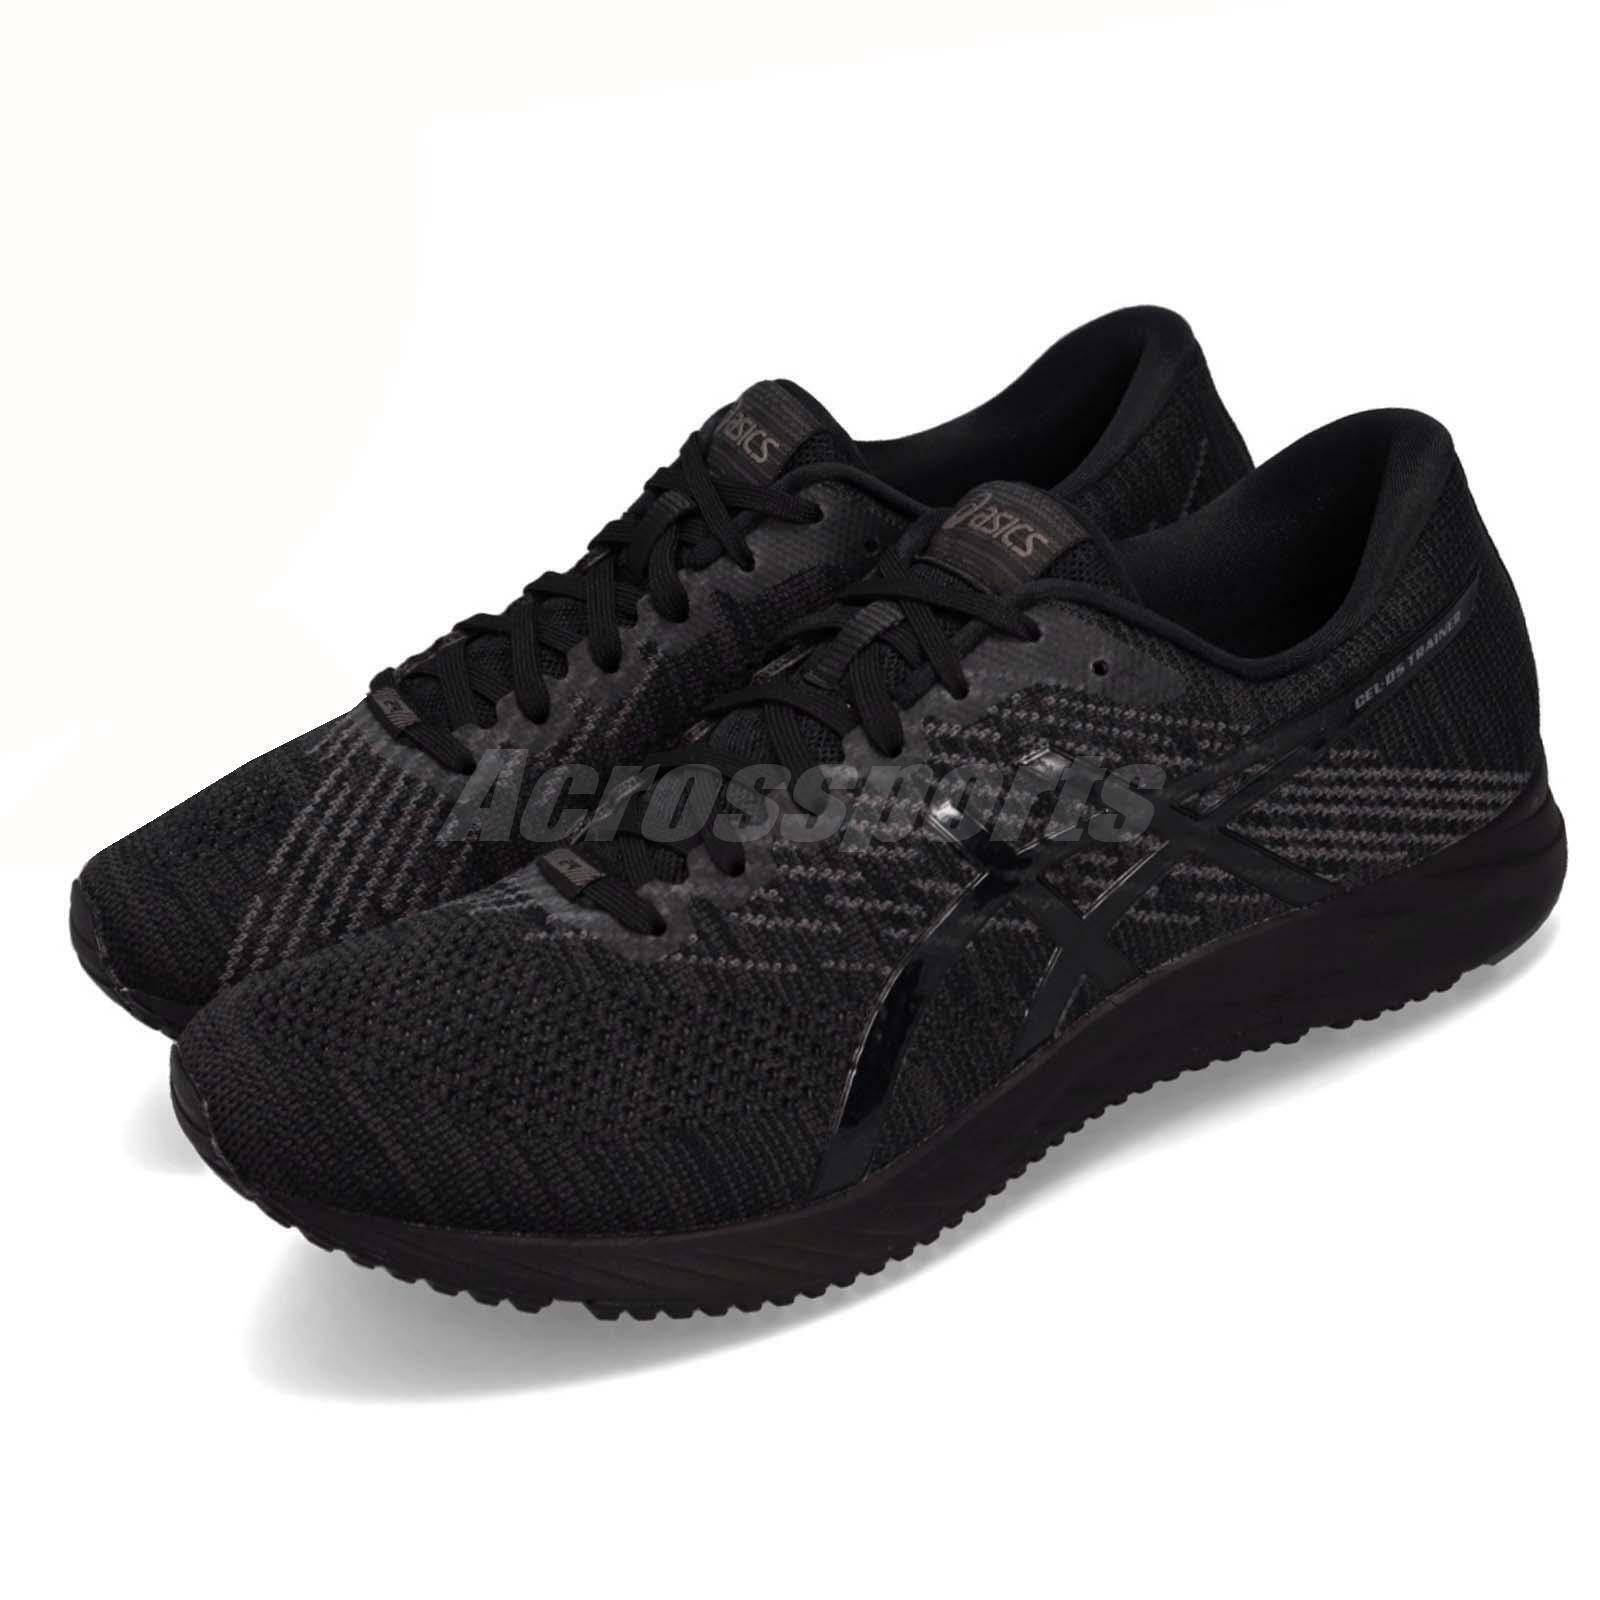 Asics Gel-ds Entrenador 24 Negro para Hombre Correr Entrenamiento Calzado Tenis 1011A176-001